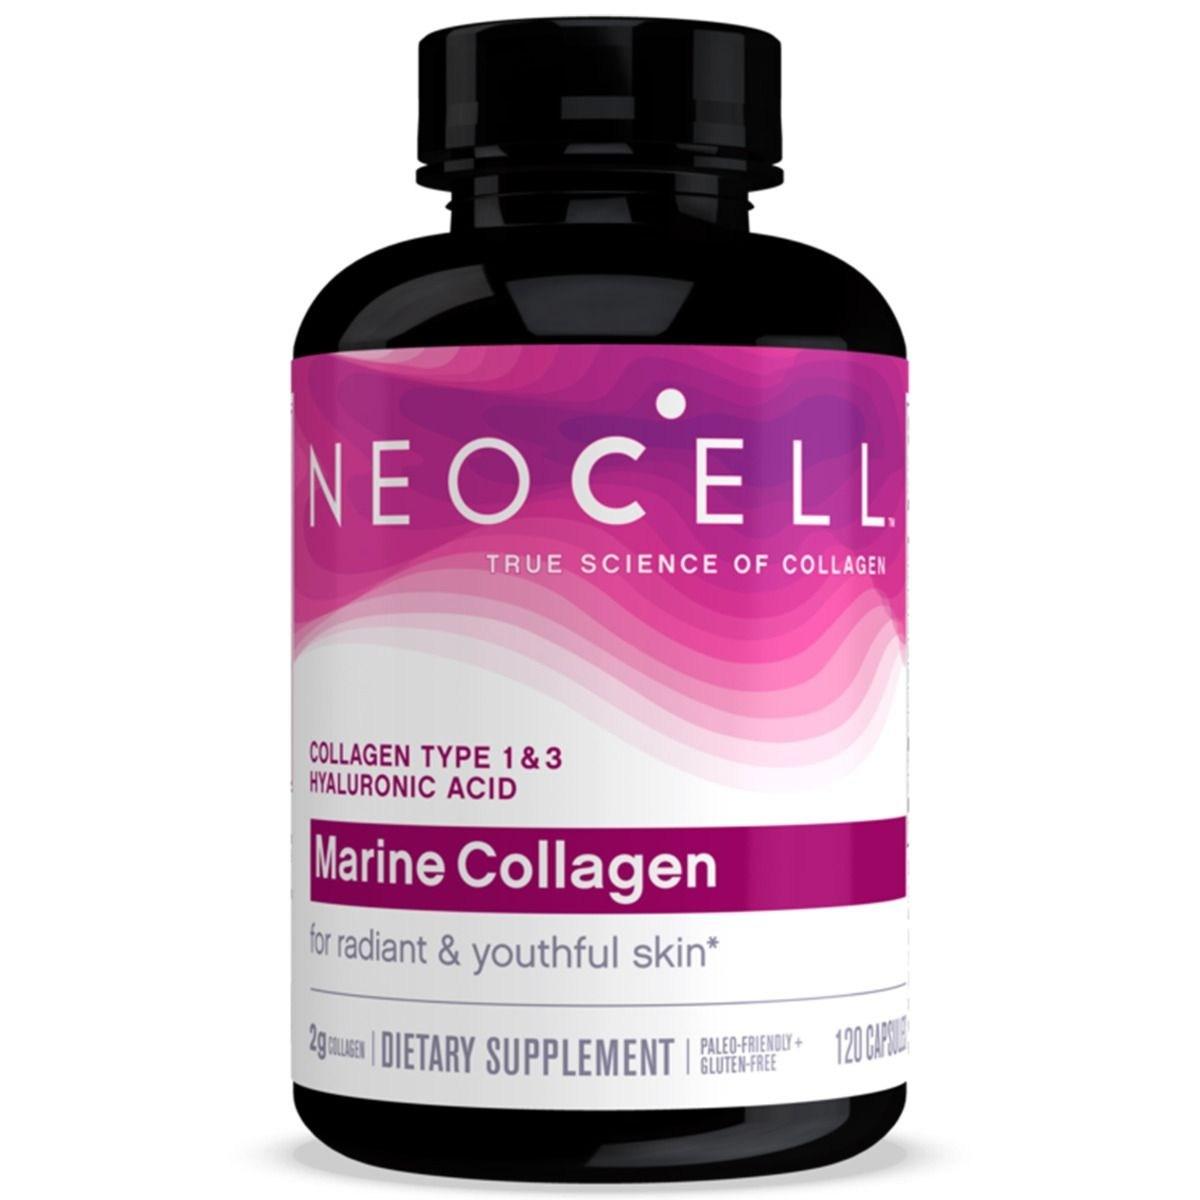 Neocell 마린 콜라겐 2000mg 캡슐, 120개입, 1개